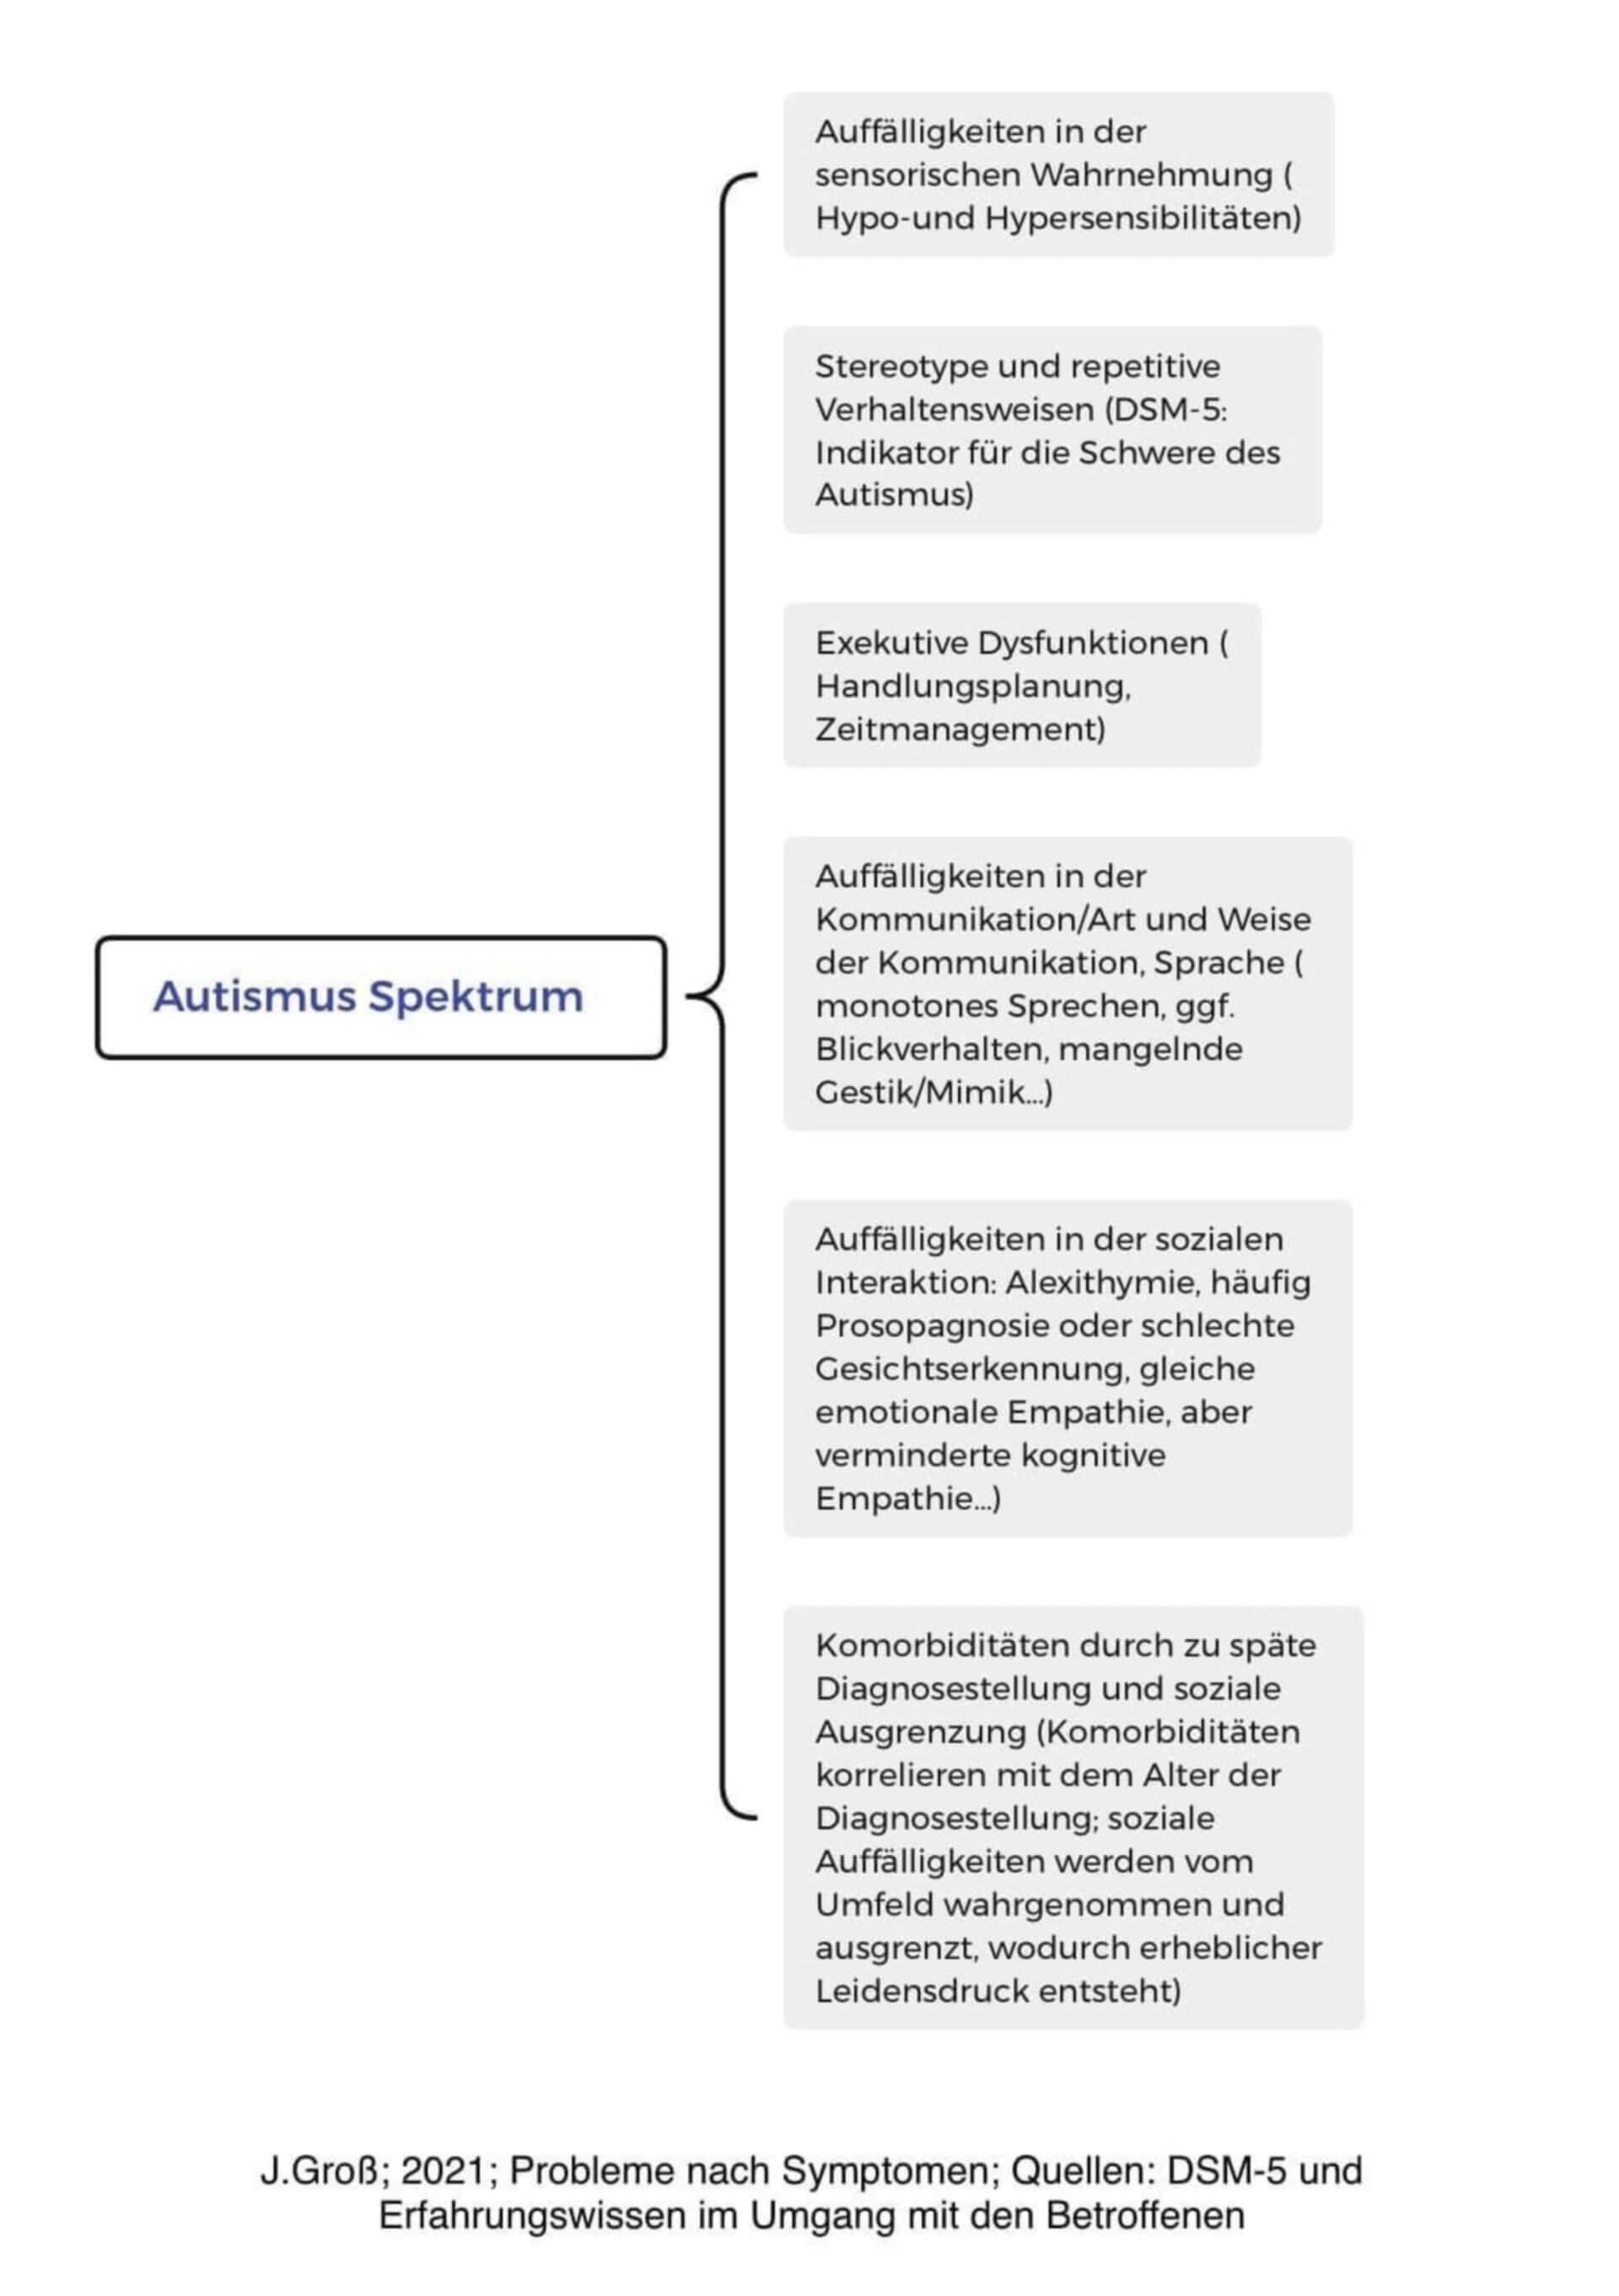 Autismus-Spektrum-Störung Kernmerkmerkmale